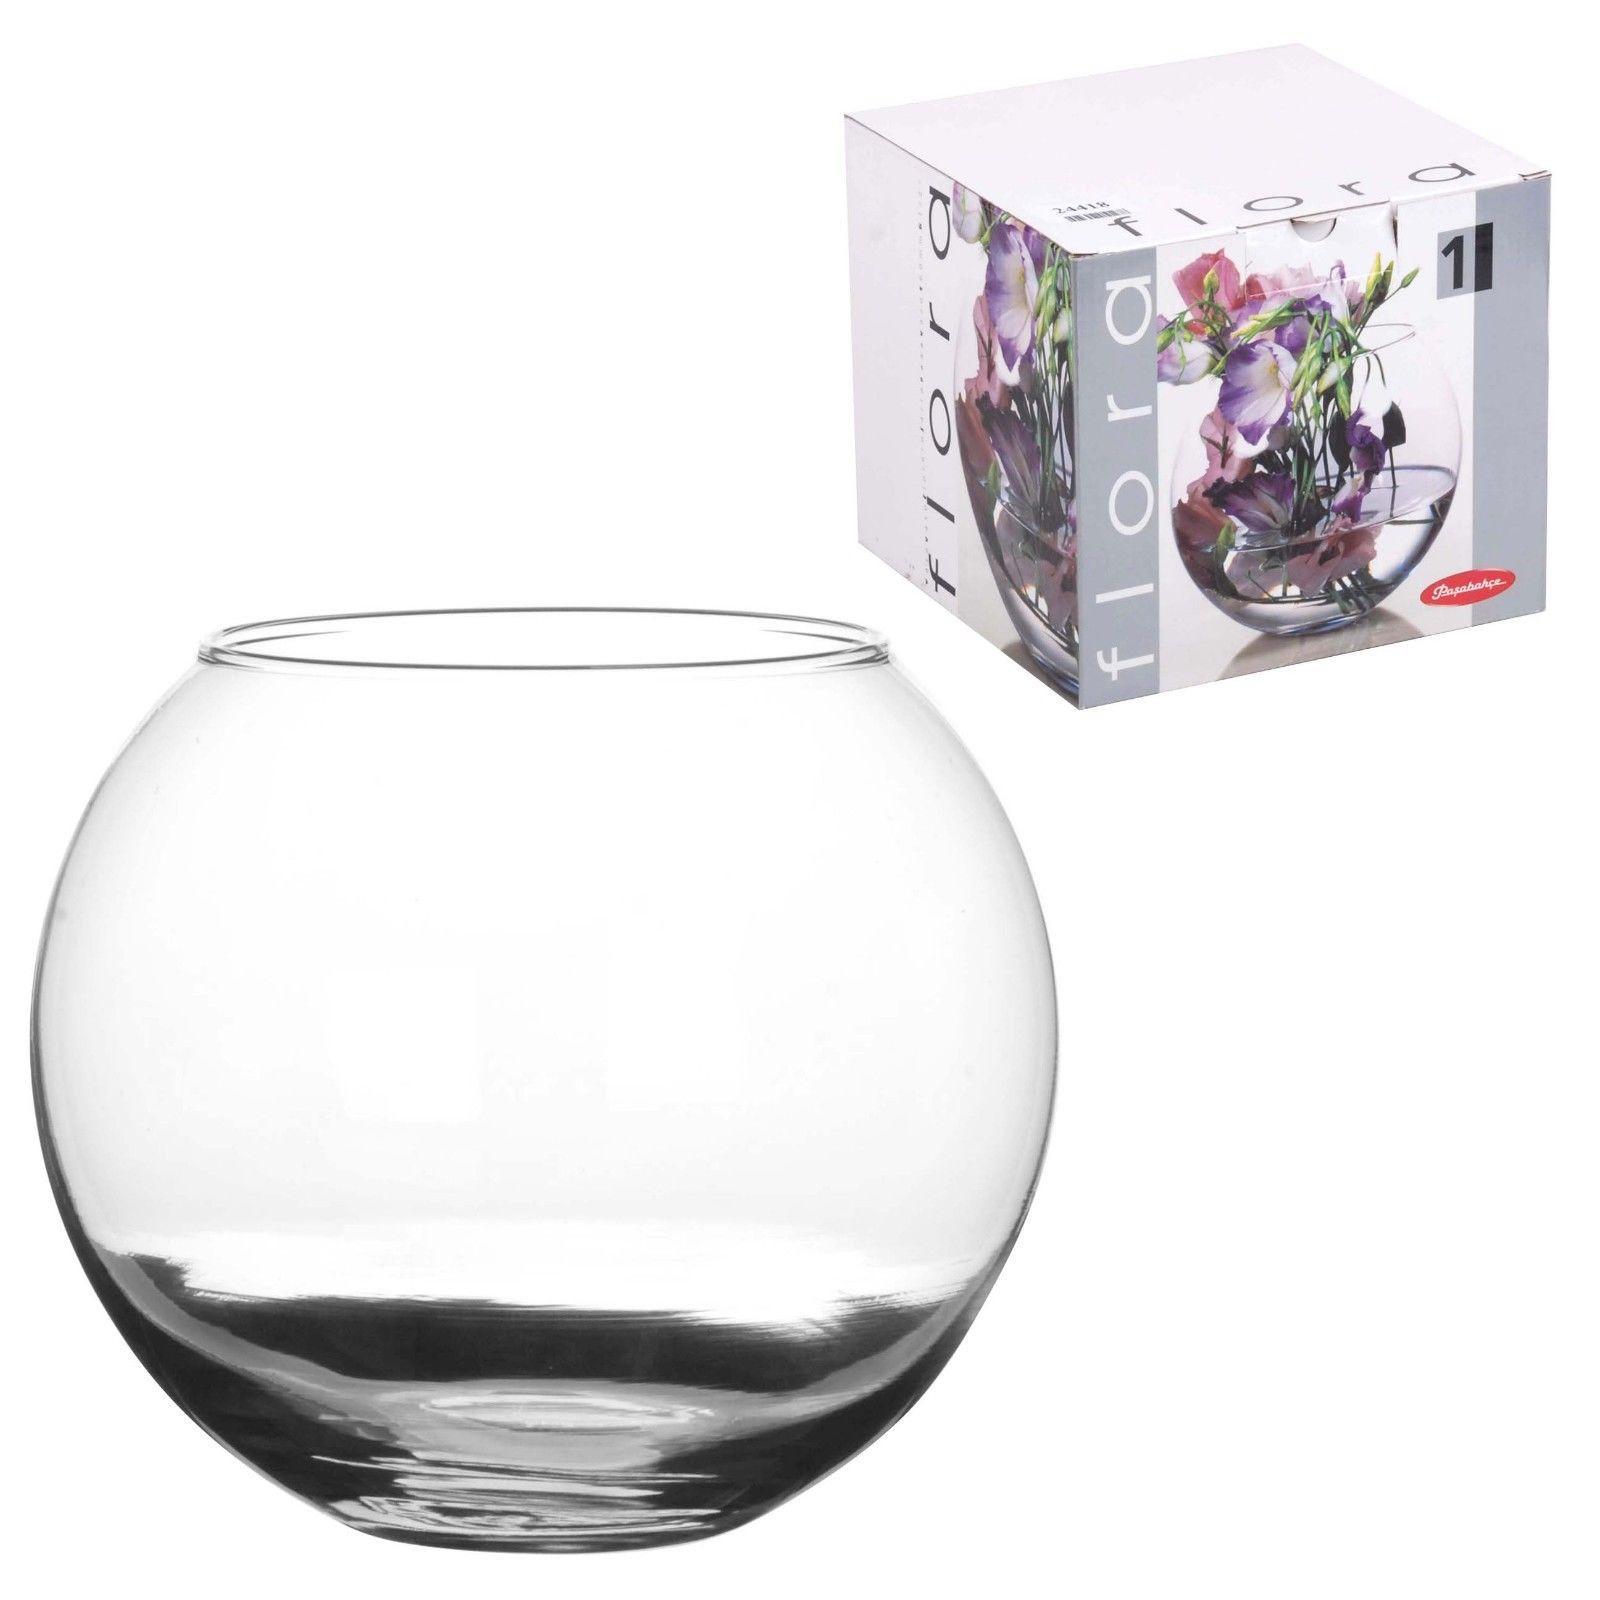 plastic bag flower vases of pasabahce glass 16cm round botanica flower vase display fish bowl within 16 cm fishbowl bubble ball bowl